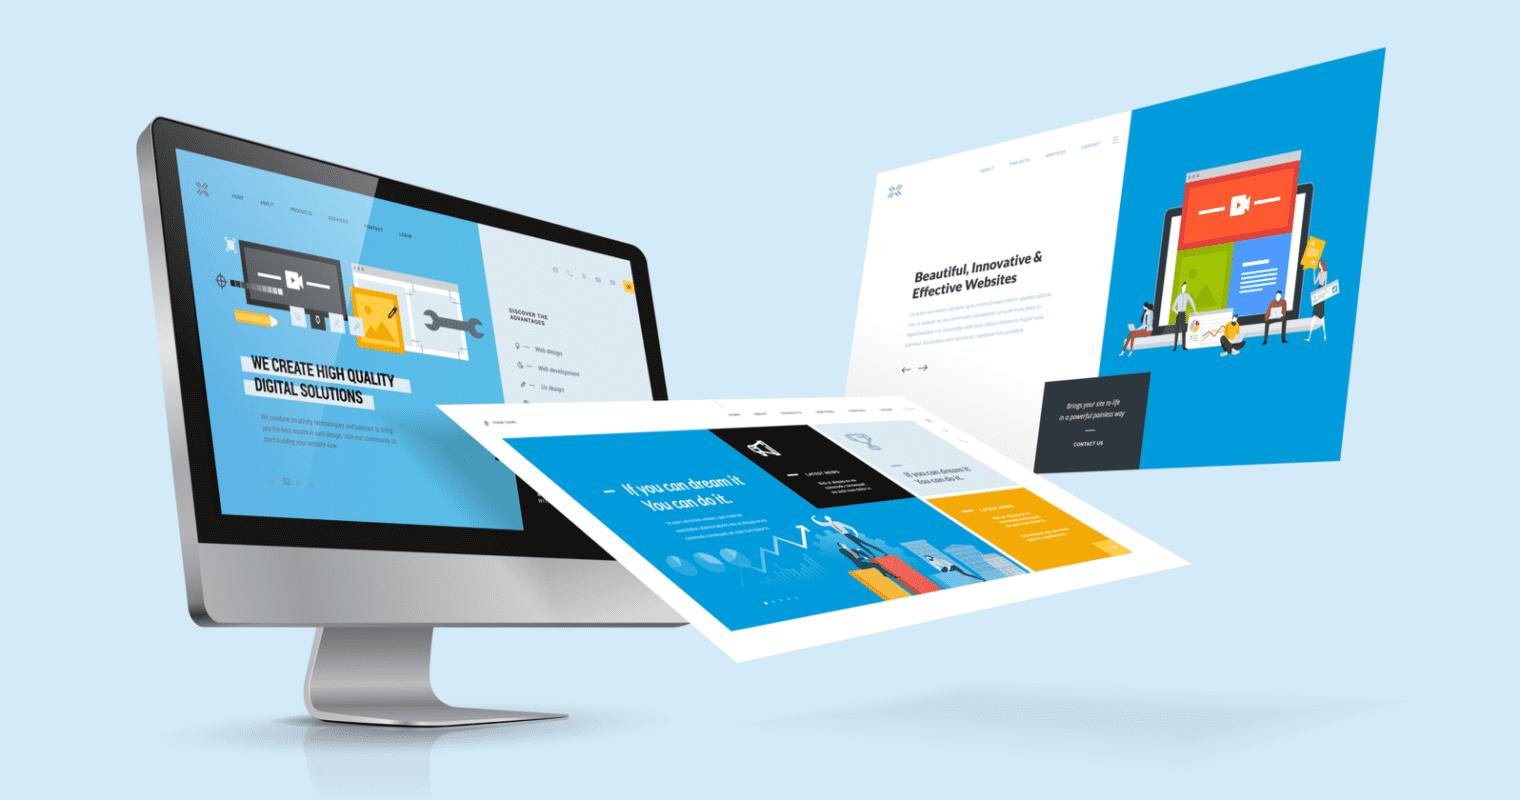 7 SEO Web Design Strategies